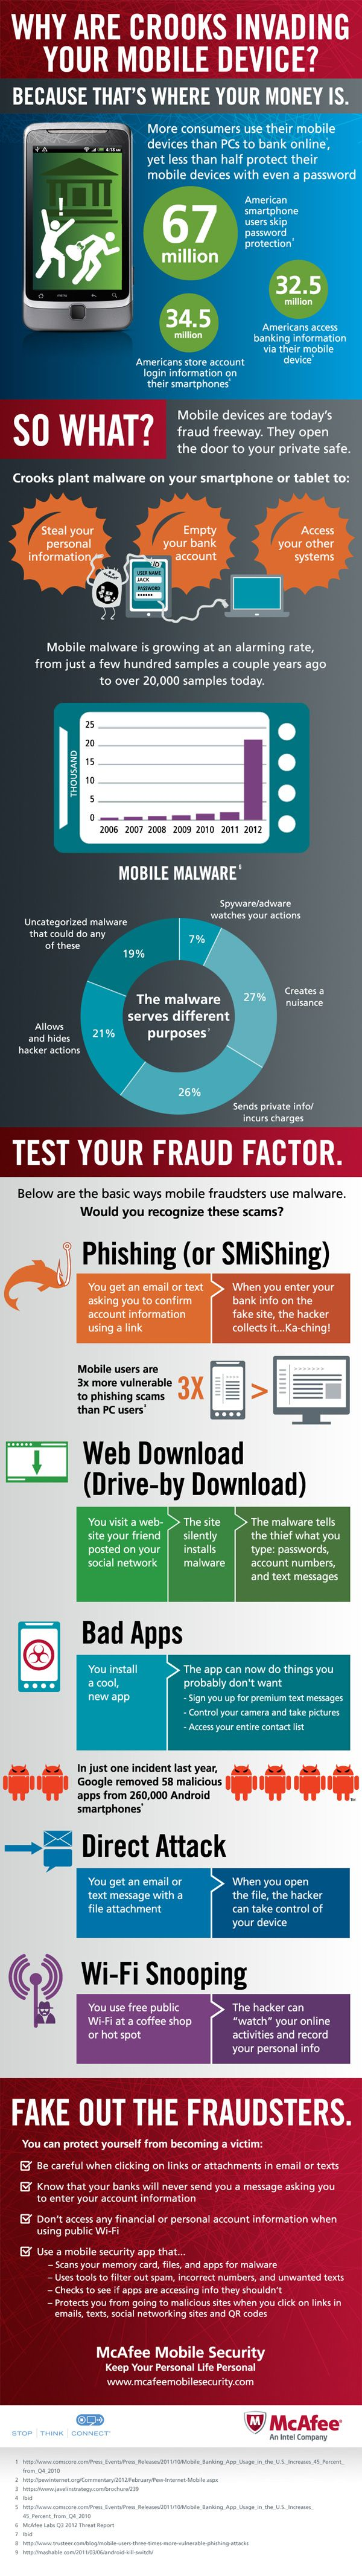 Mobile Malware is Here: Beware!